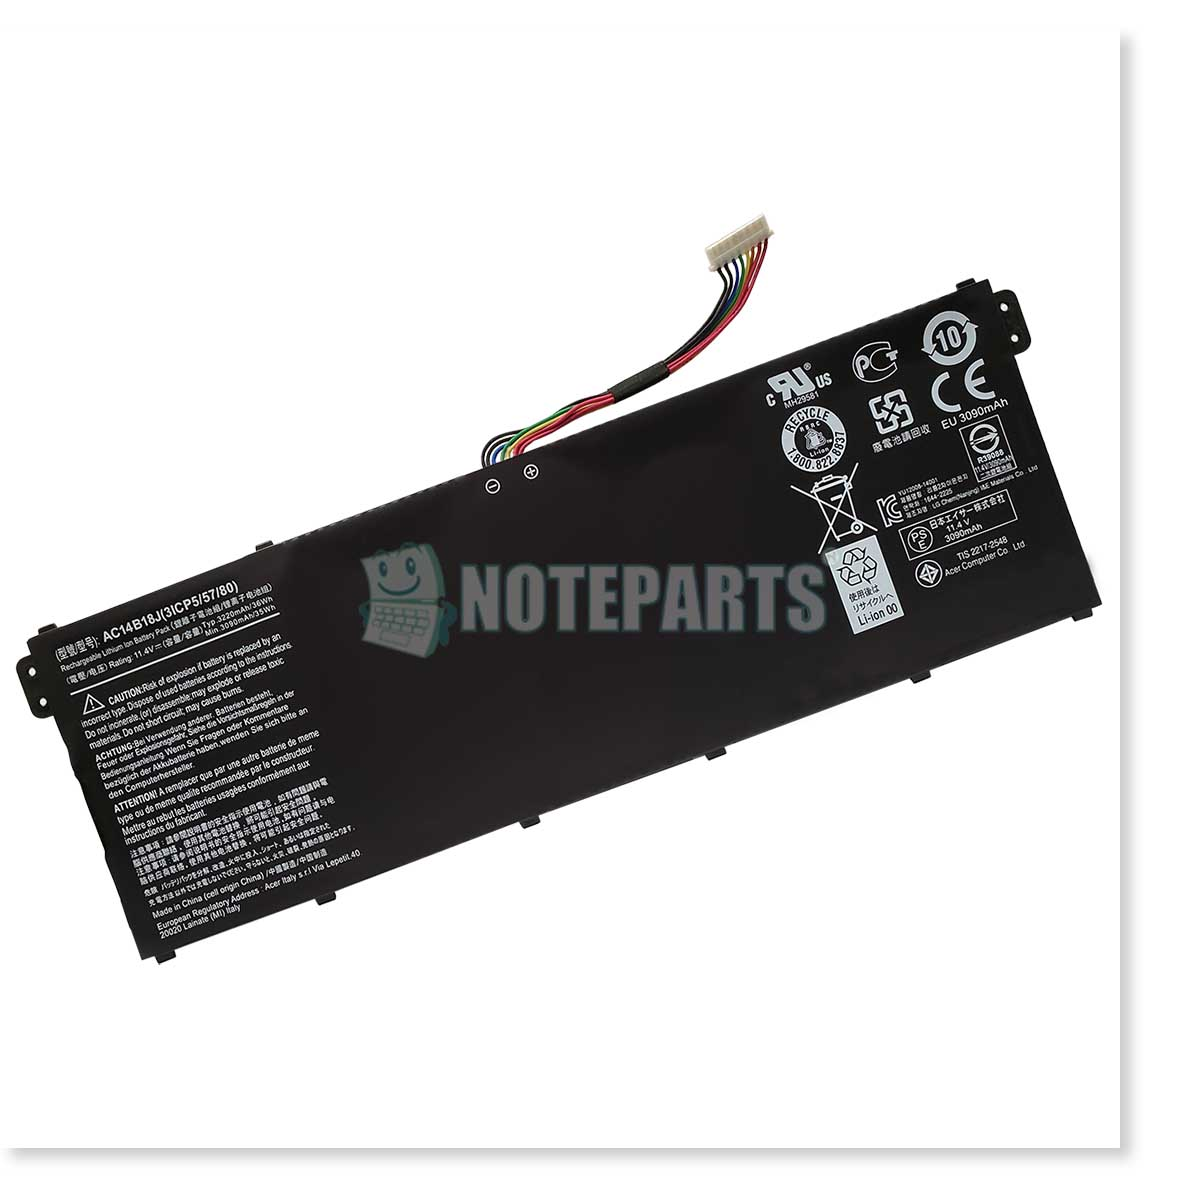 Acer純正 エイサー Aspire ES1-132 ES1-332 ES1-533 バッテリー AC14B13J AC14B18J